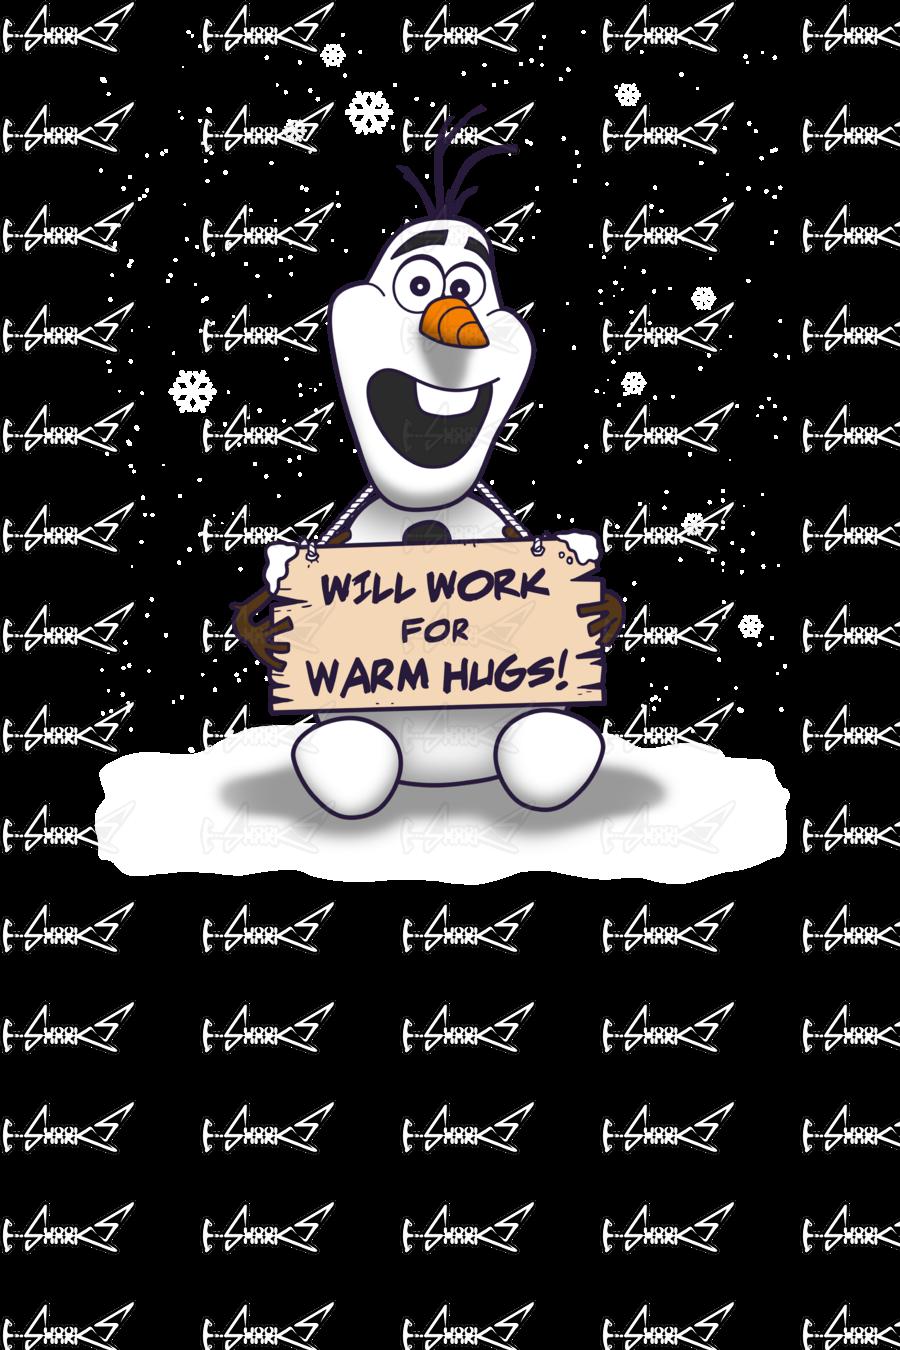 Olaf clipart warm hug. Will work for hugs